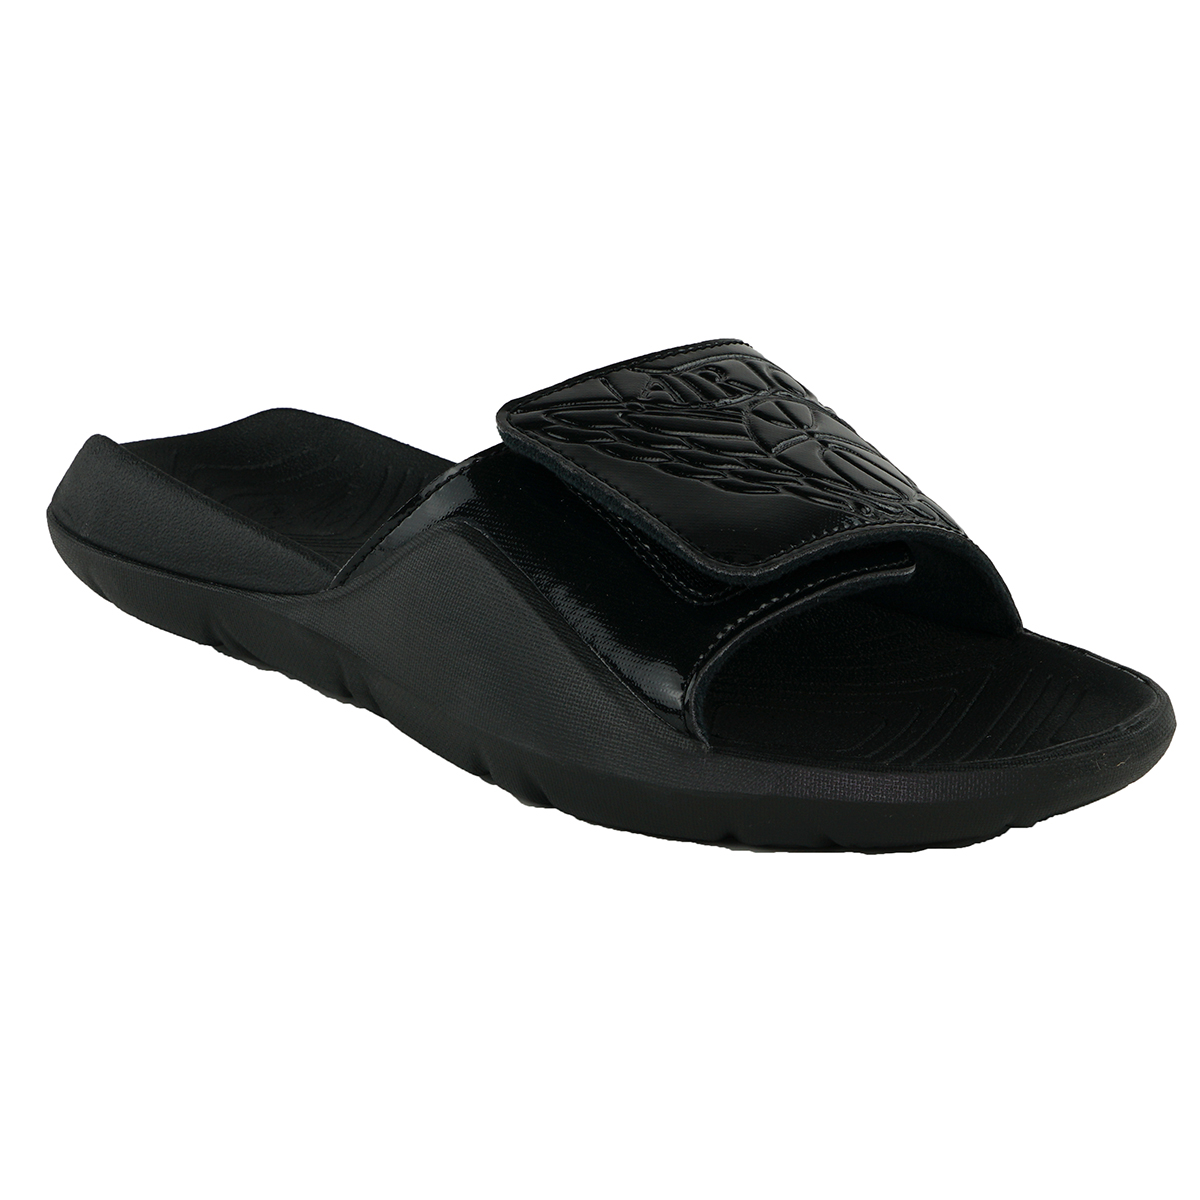 429c30c63306e1 Air Jordan Men s Hydro 7 Slide Sandals Black Black 11 884498883549 ...